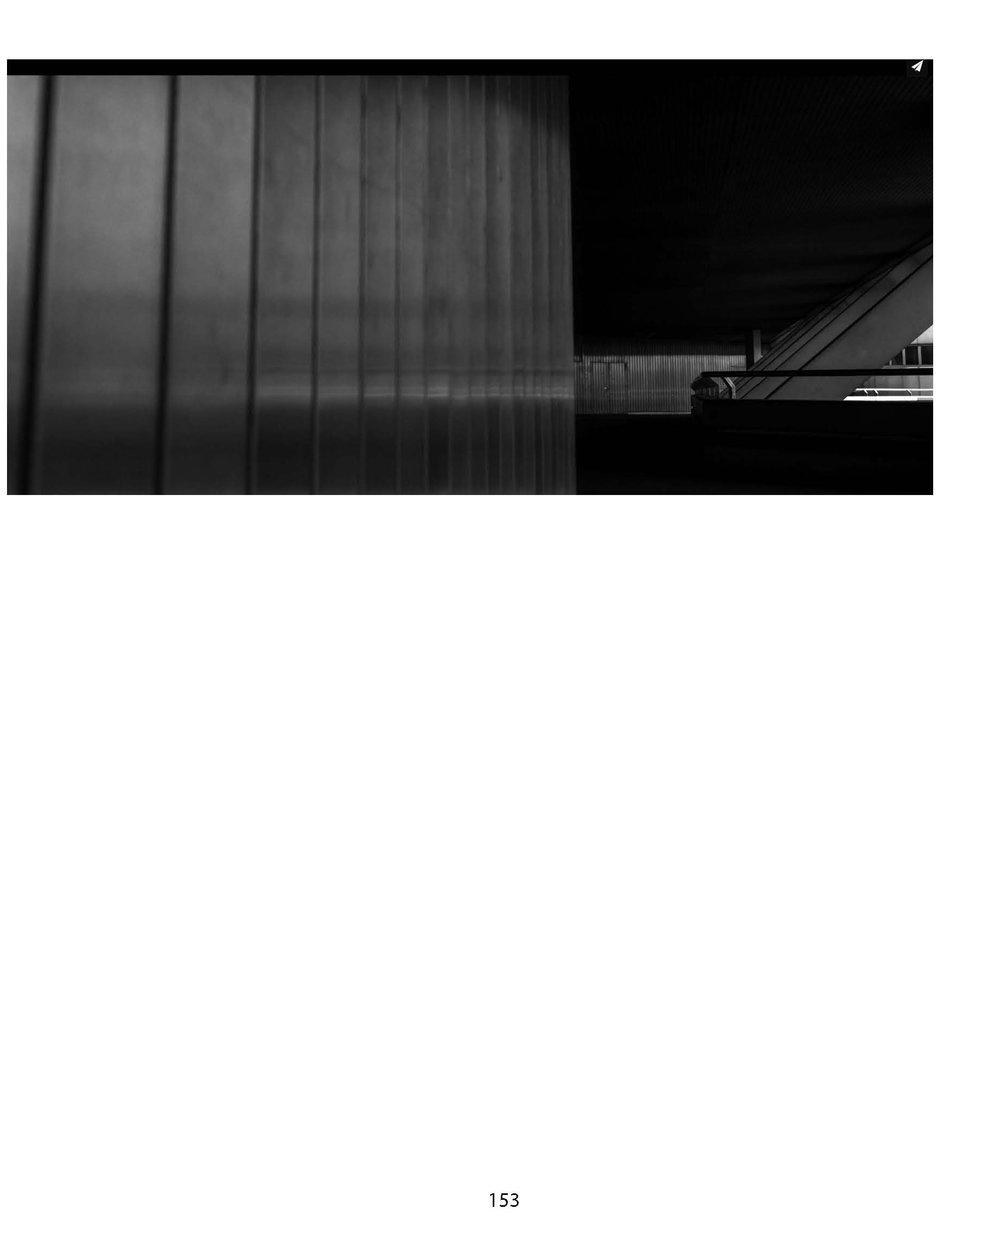 256_Final_Page_153.jpg